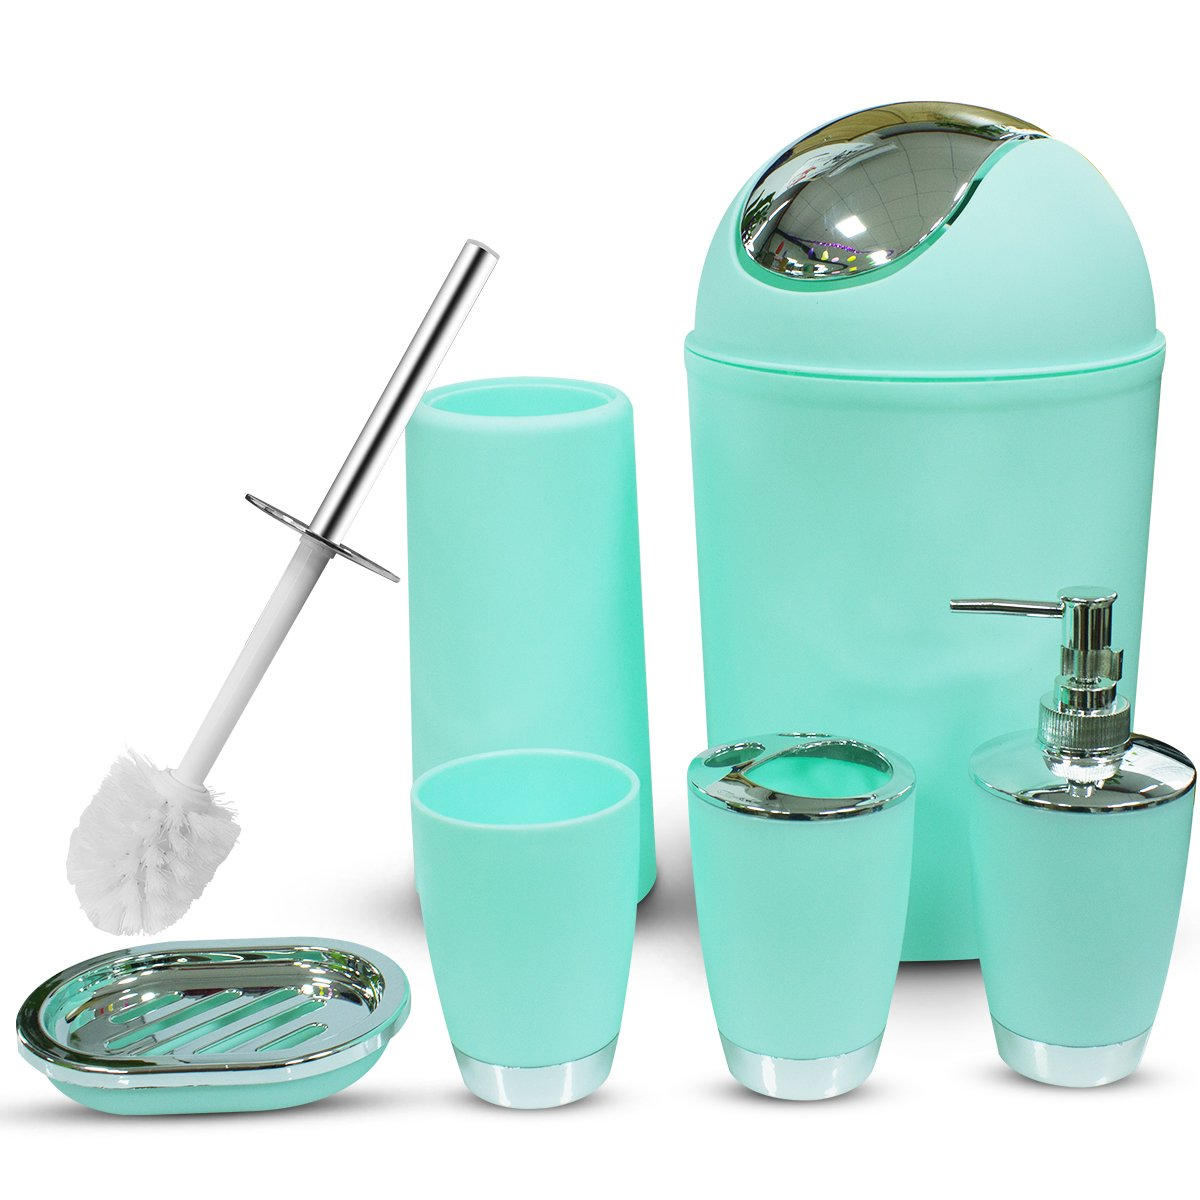 Amazon.com: Dergixee Bathroom Accessories Set, 6 Piece Plastic Bathroom Accessory Set, Trash Can, Lotion Dispenser, Soap Bar Holder, Toothbrush Holder, ...